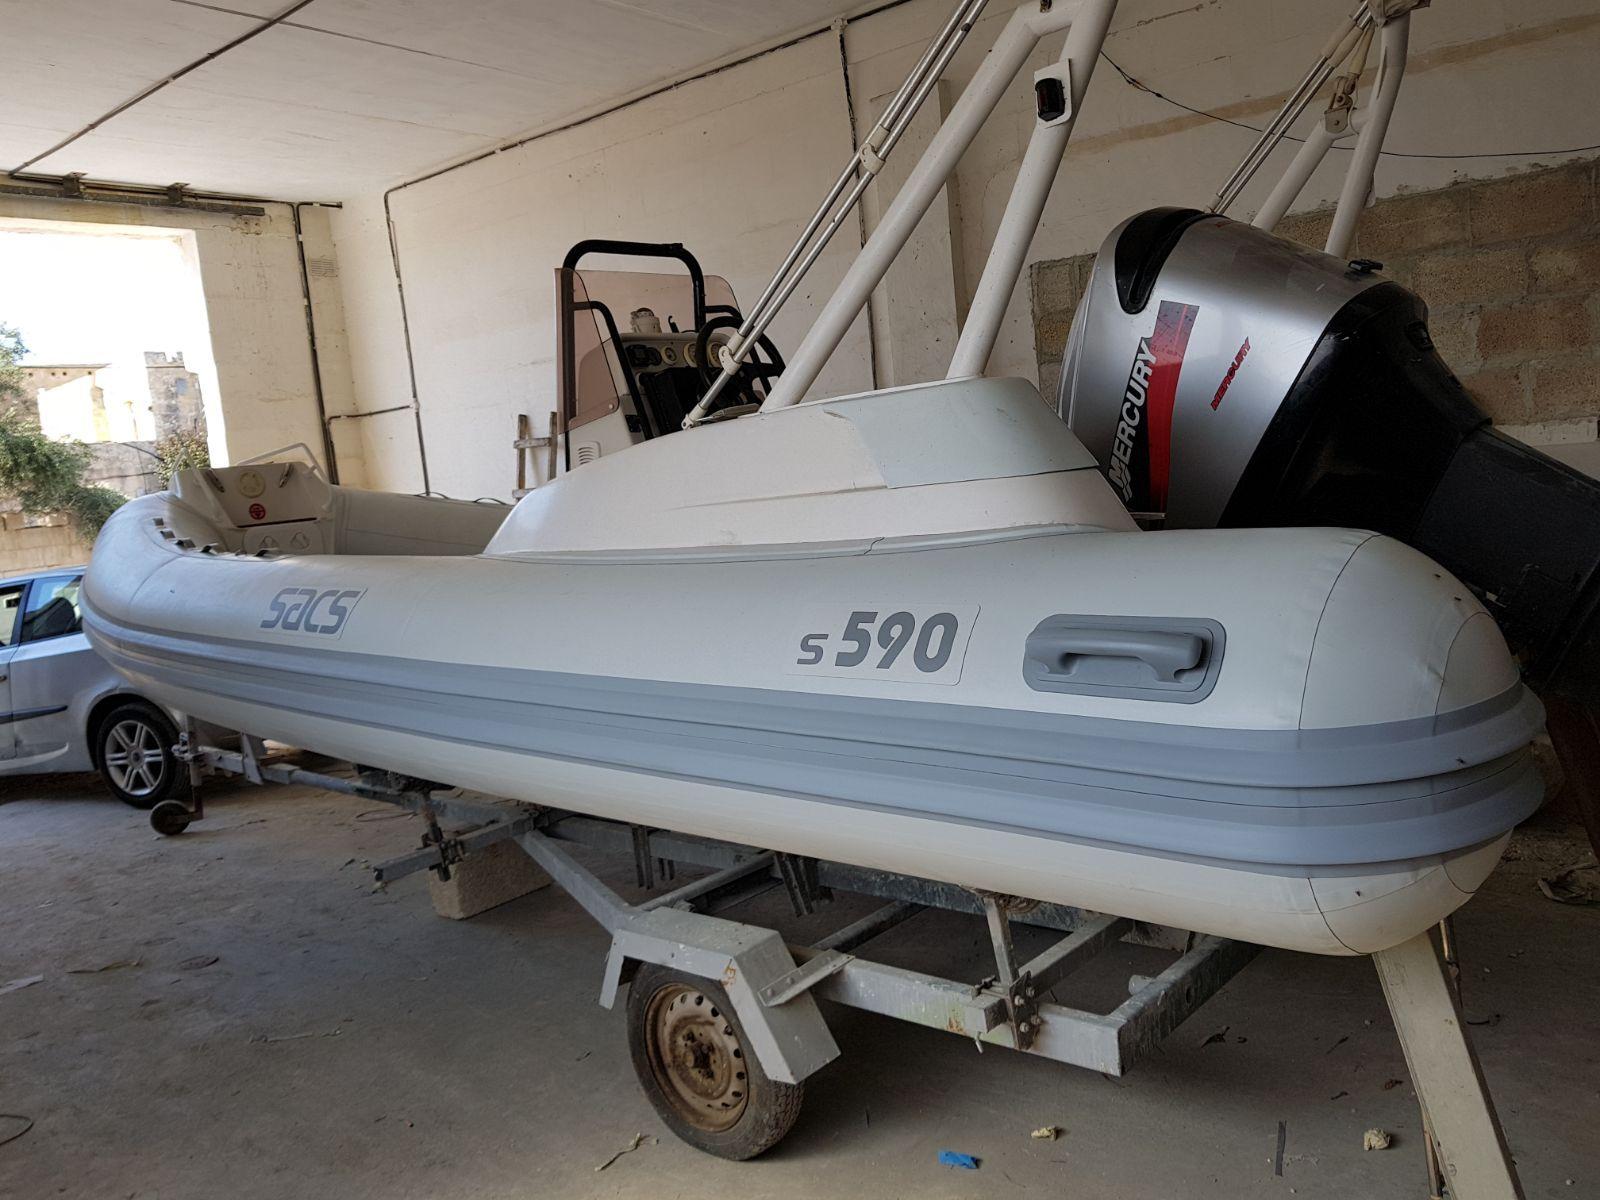 Boat Care, Repairs & Maintenance | Malta | Marine Services Ltd